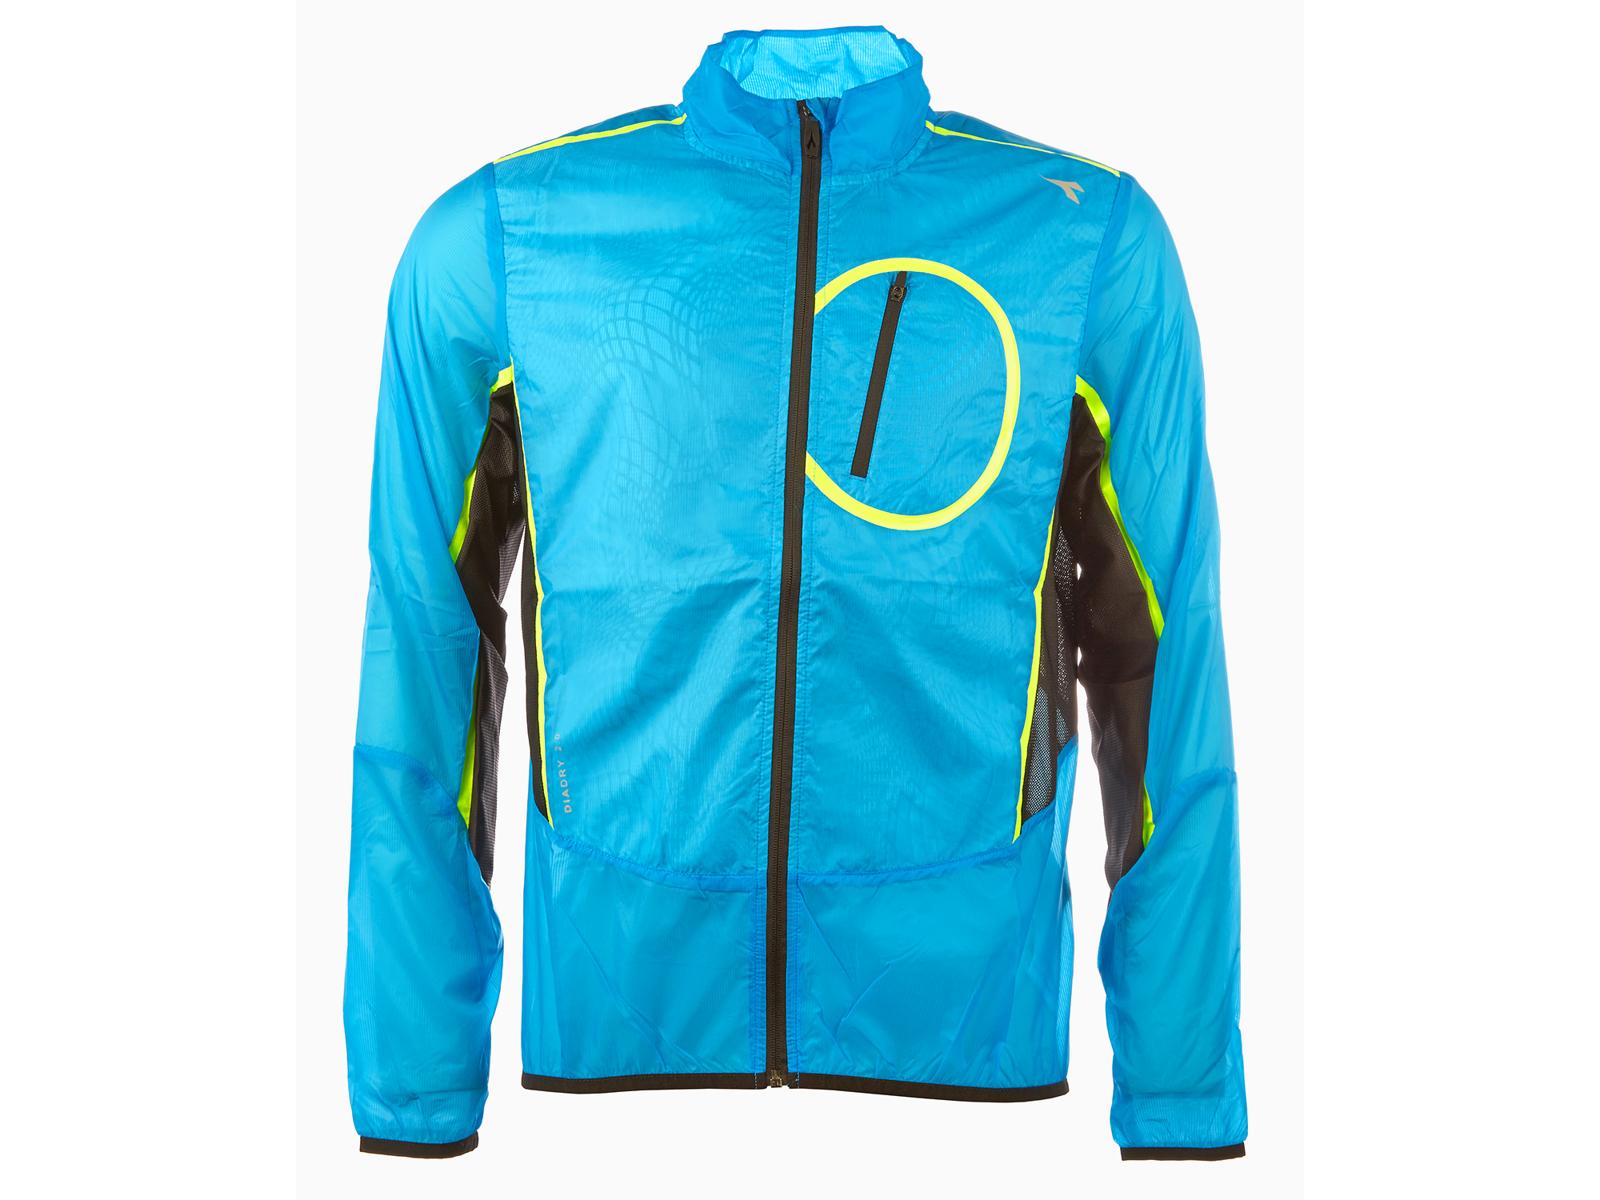 Diadora løbejakke Herre Wind Jacket Blå (DKK 319,60)